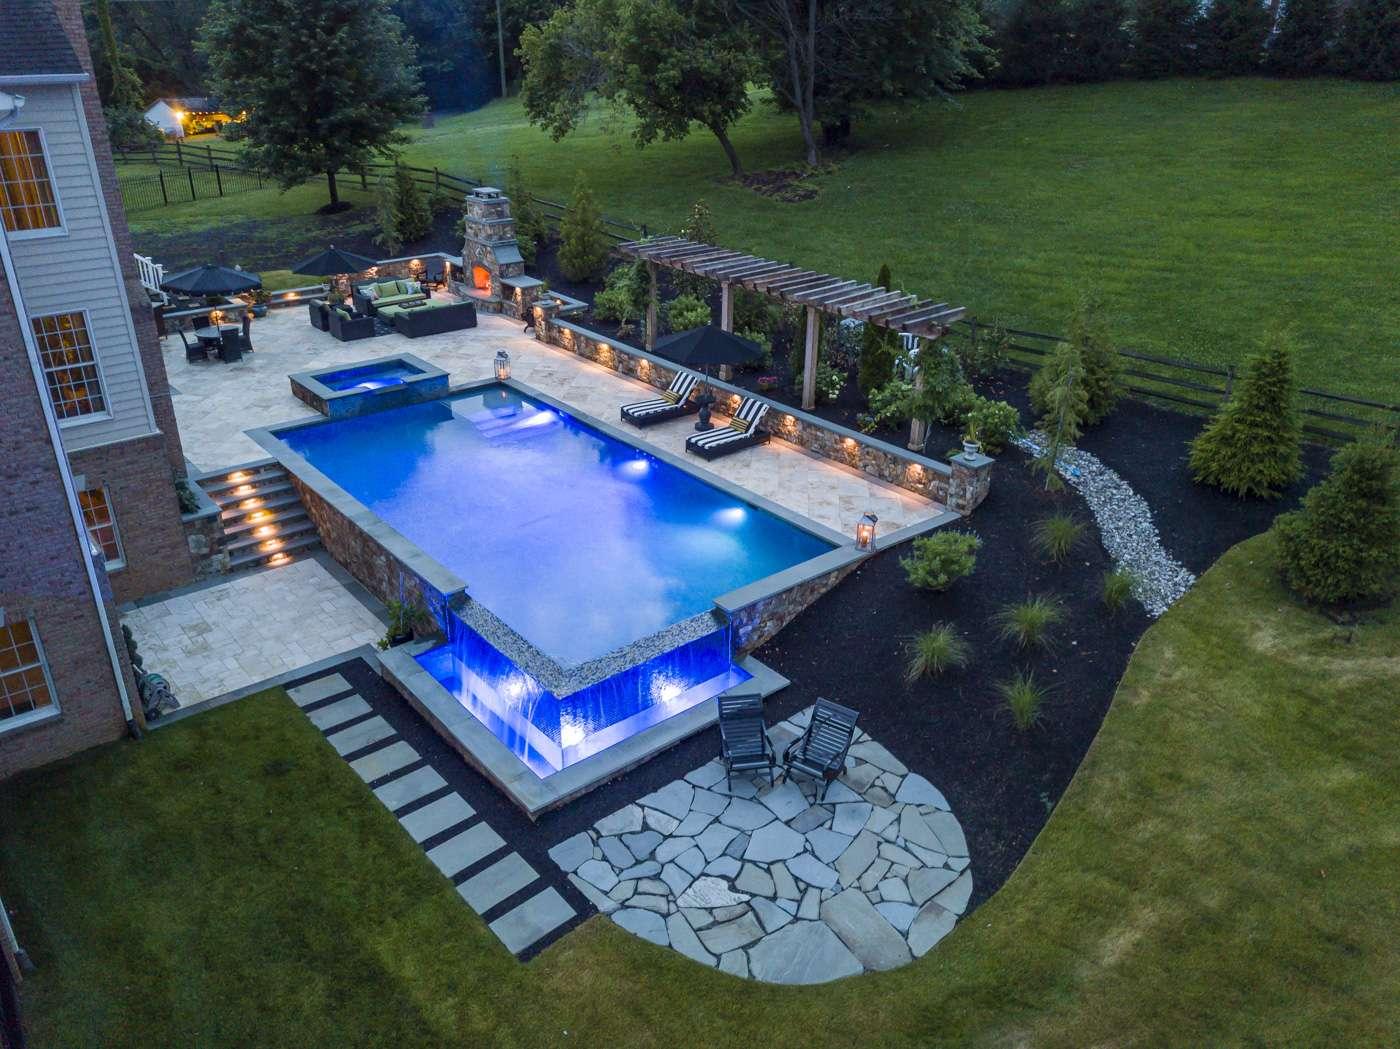 aerial-pool-lighting-infinity-edge-fireplace-stone-wall-1